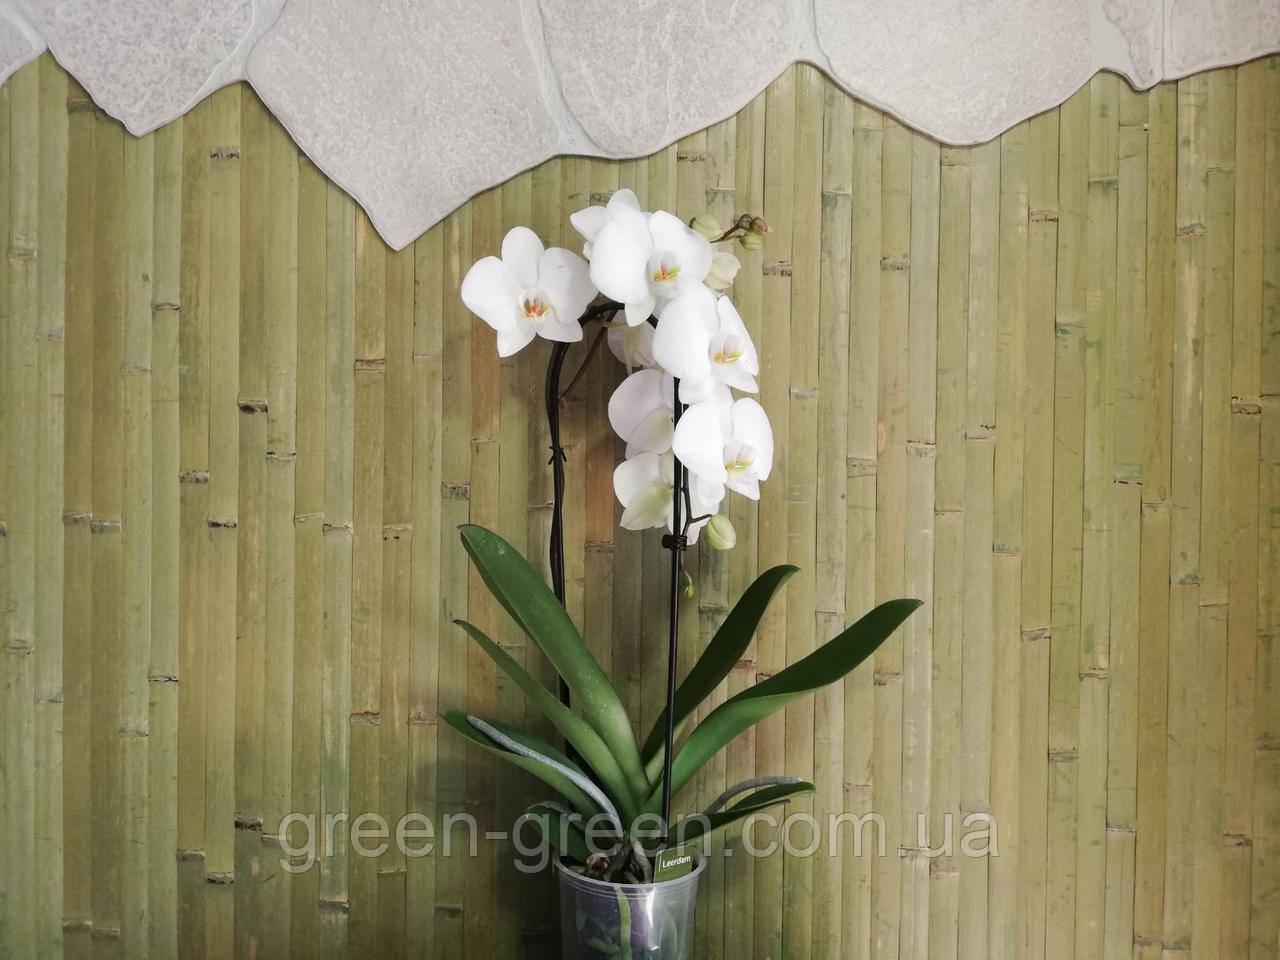 Орхідея Фаленопсис Каскад біла (Cascade)